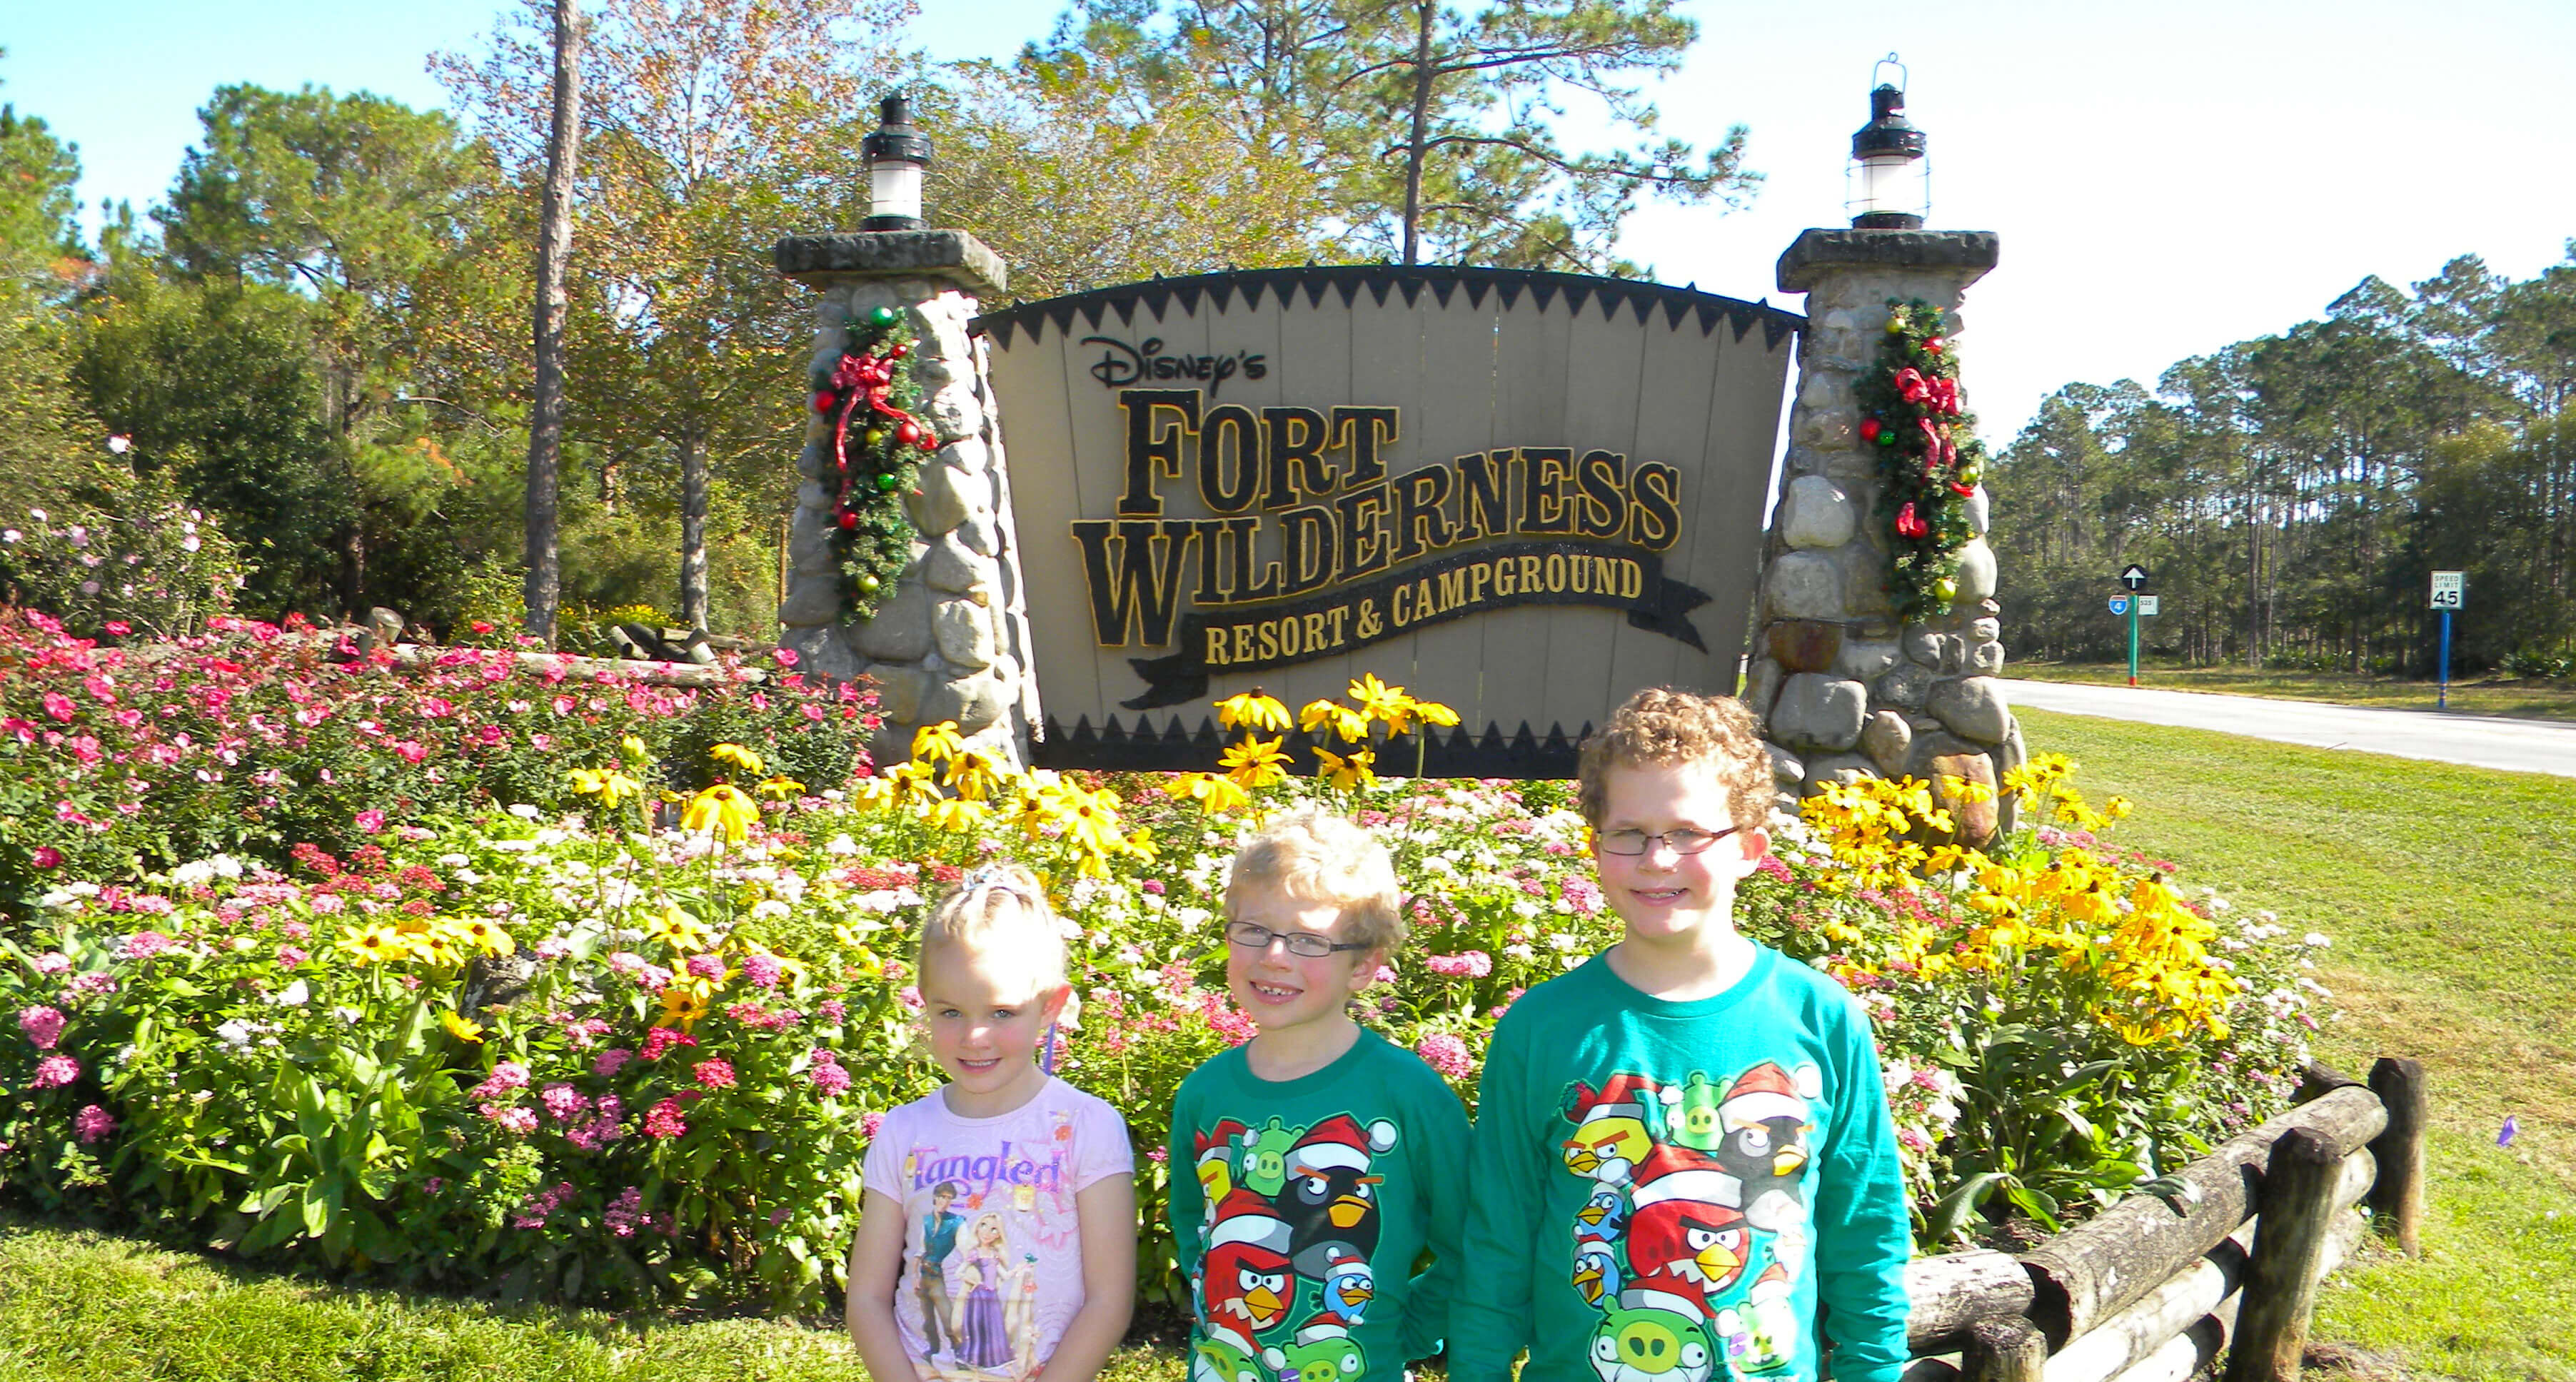 Disney World planning timeline - Fort Wilderness